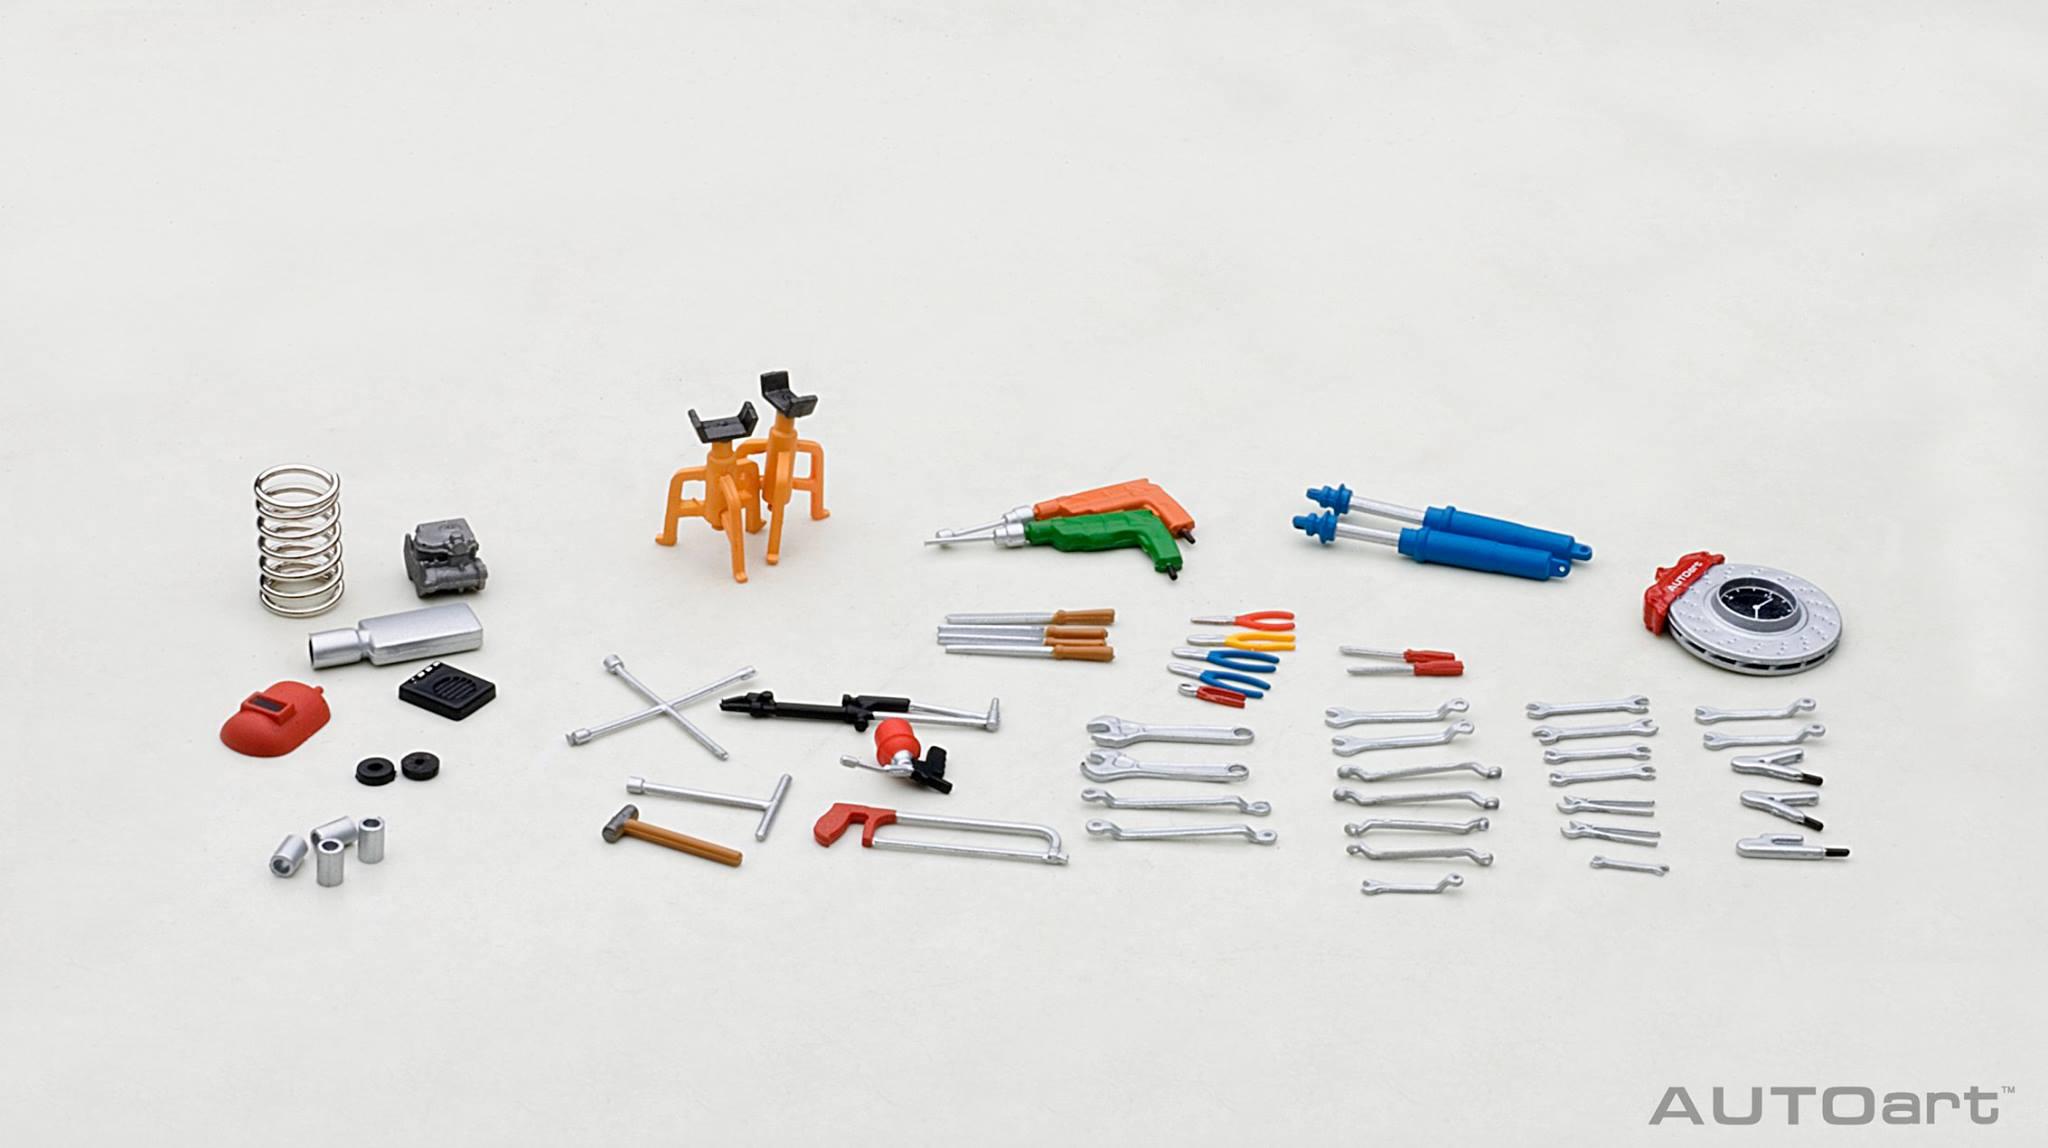 Garage Kit Set By Autoart